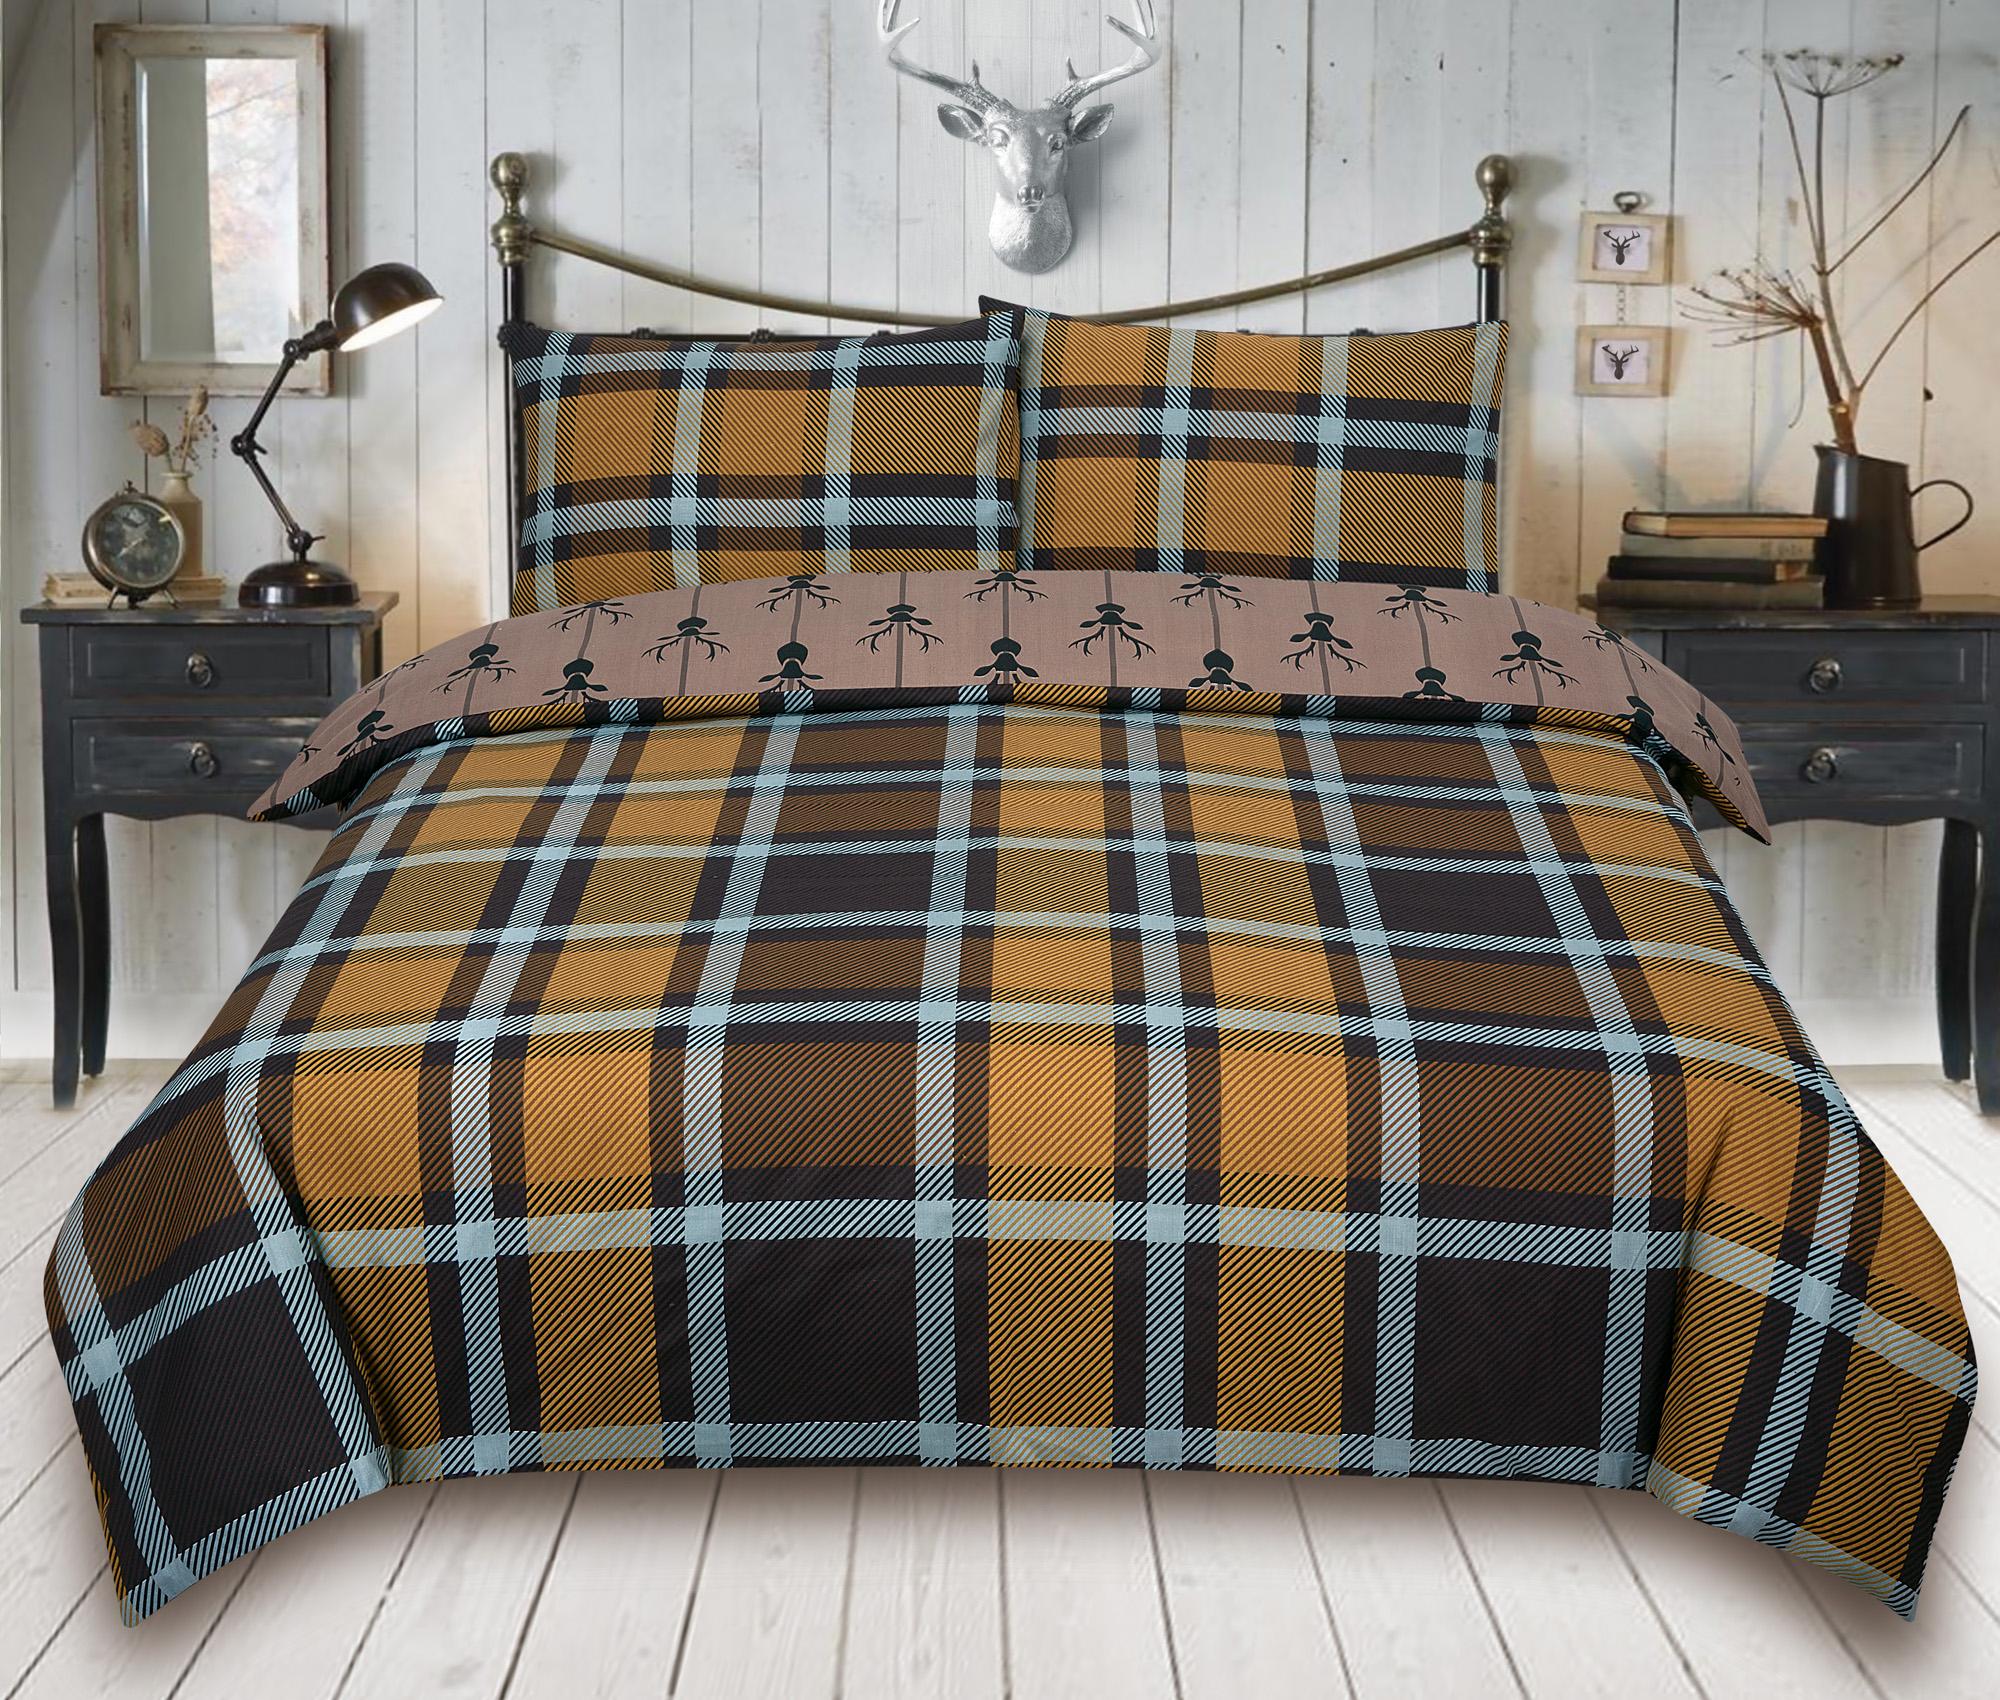 Check-Stag-Tartan-Deer-Antlers-Bedding-Single-Double-King-Duvet-Quilt-Cover-Set miniatura 4